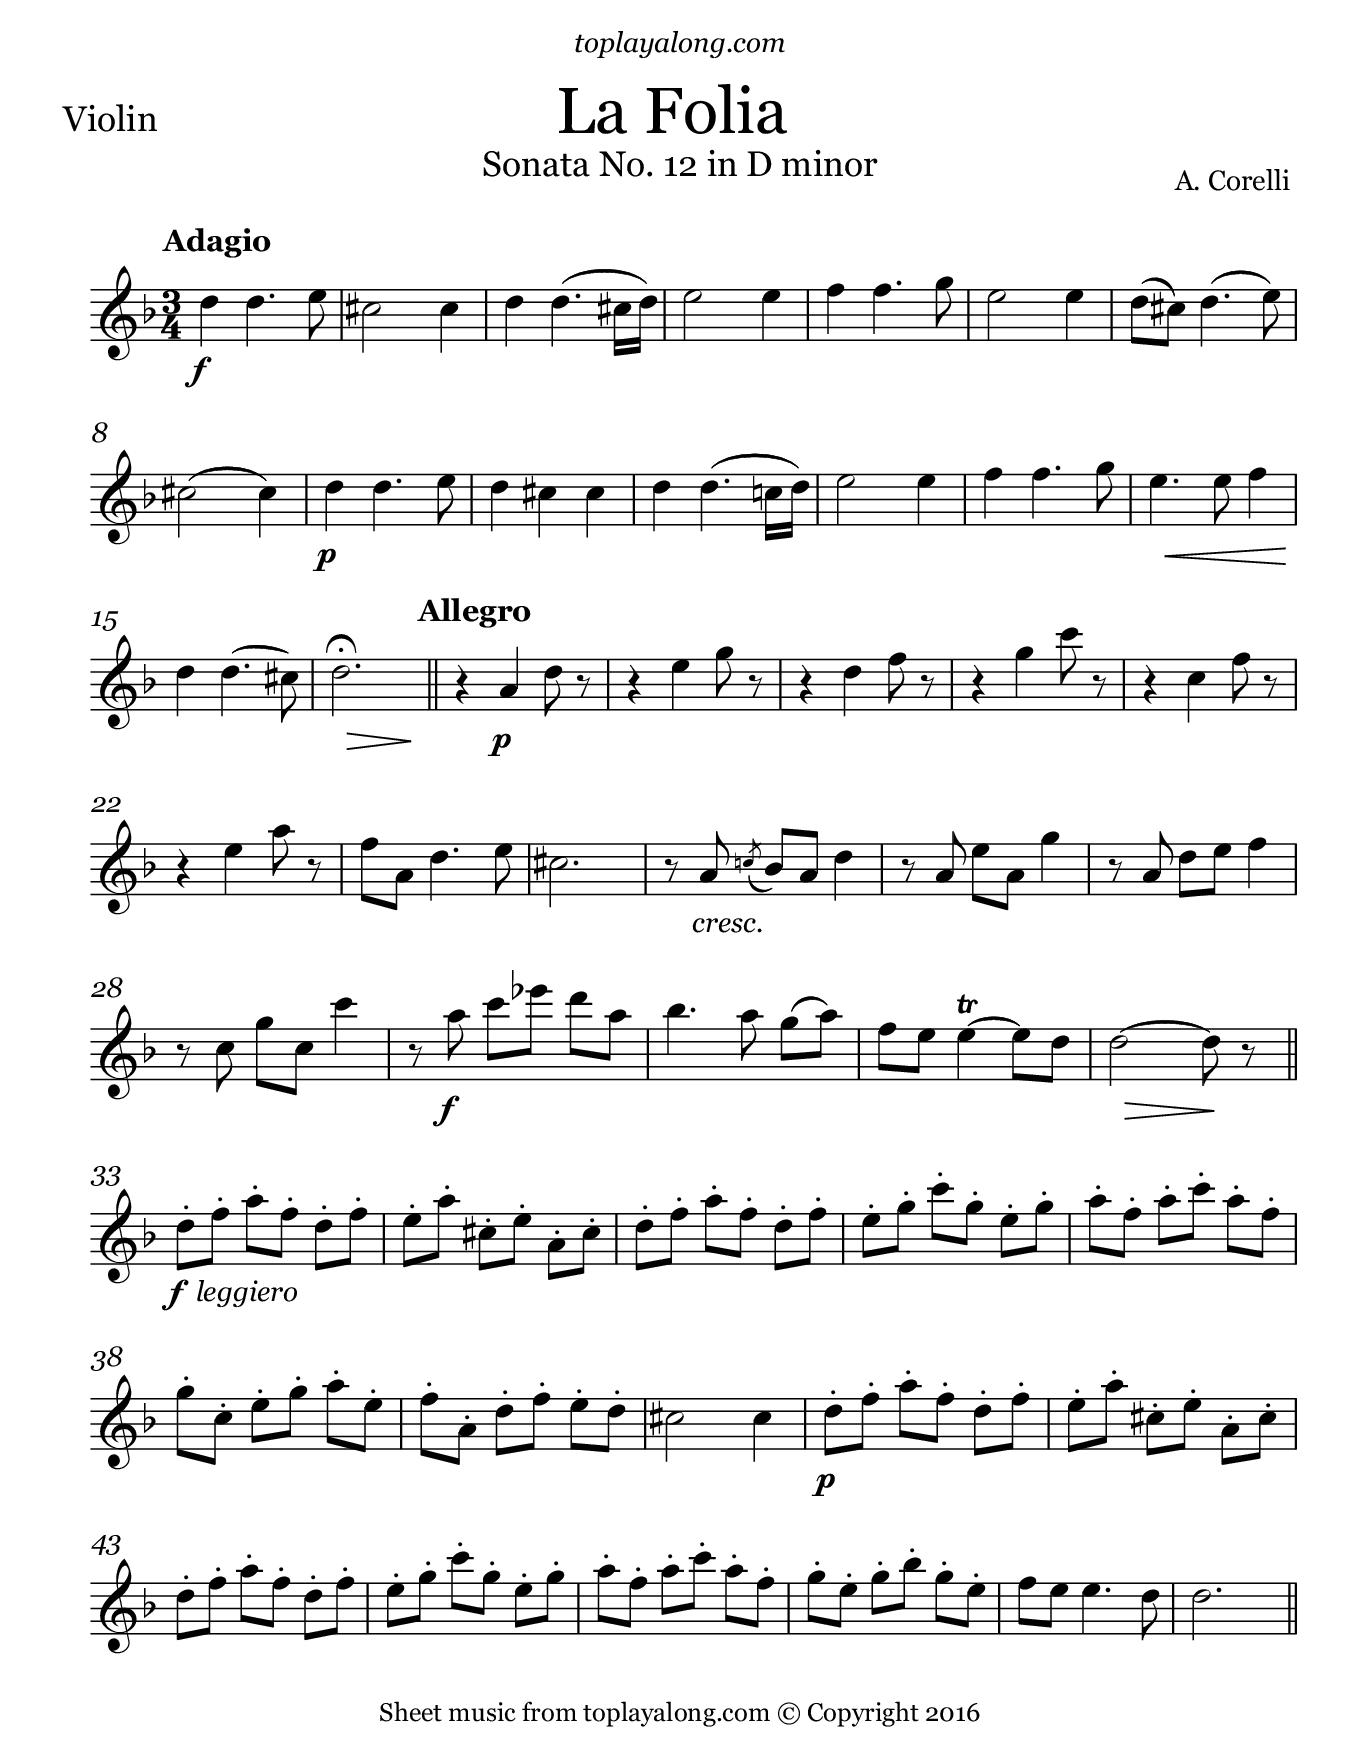 La Folia Suzuki Sheet Music Free